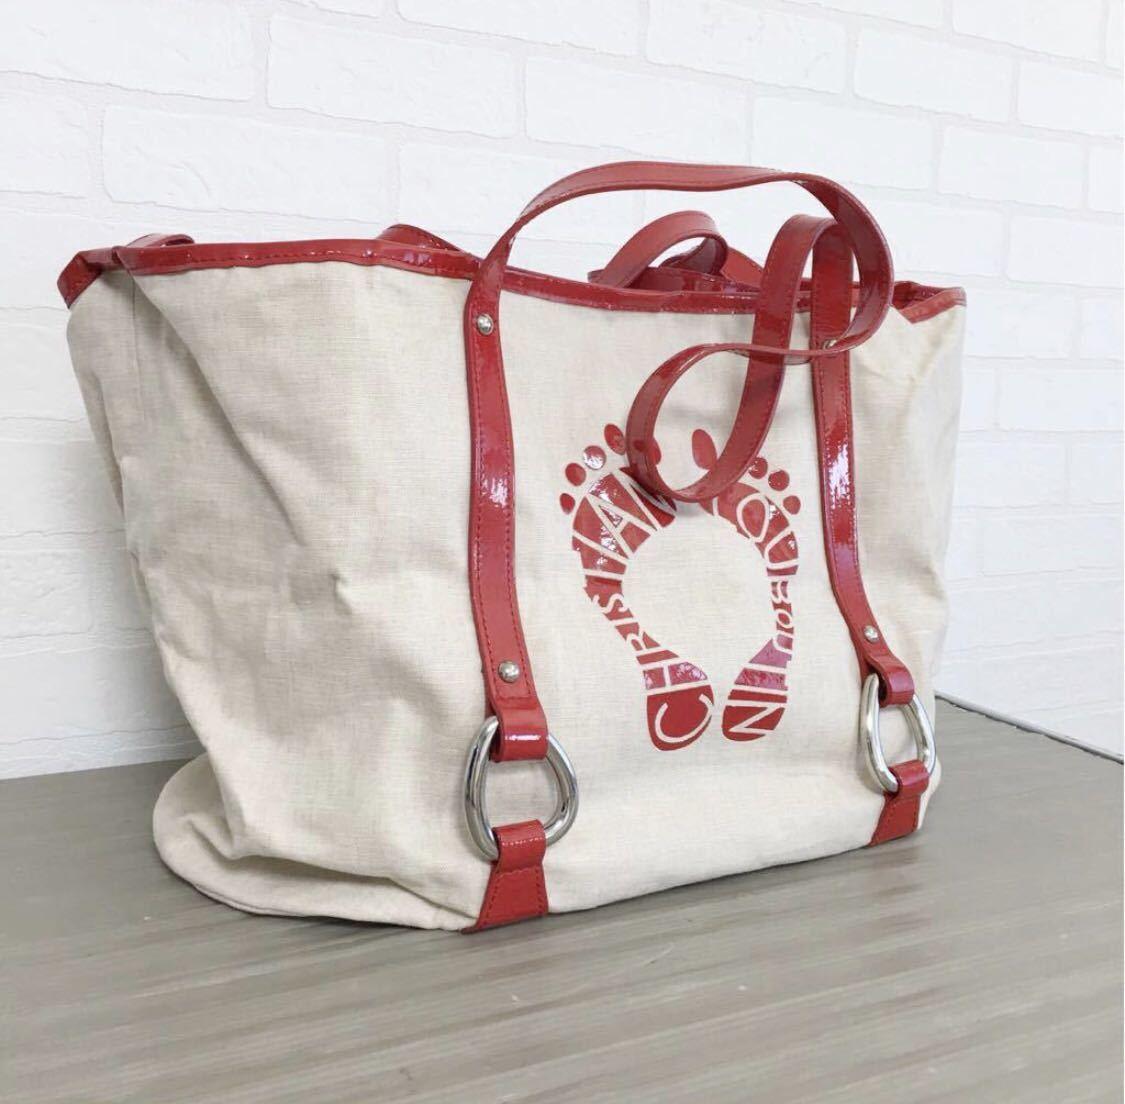 665bdc3c3938 Christian Louboutin クリスチャン ルブタン トートバッグ ハンドバッグ レザー使用 レディース 赤 ベージュ オシャレ 鞄 かばんの